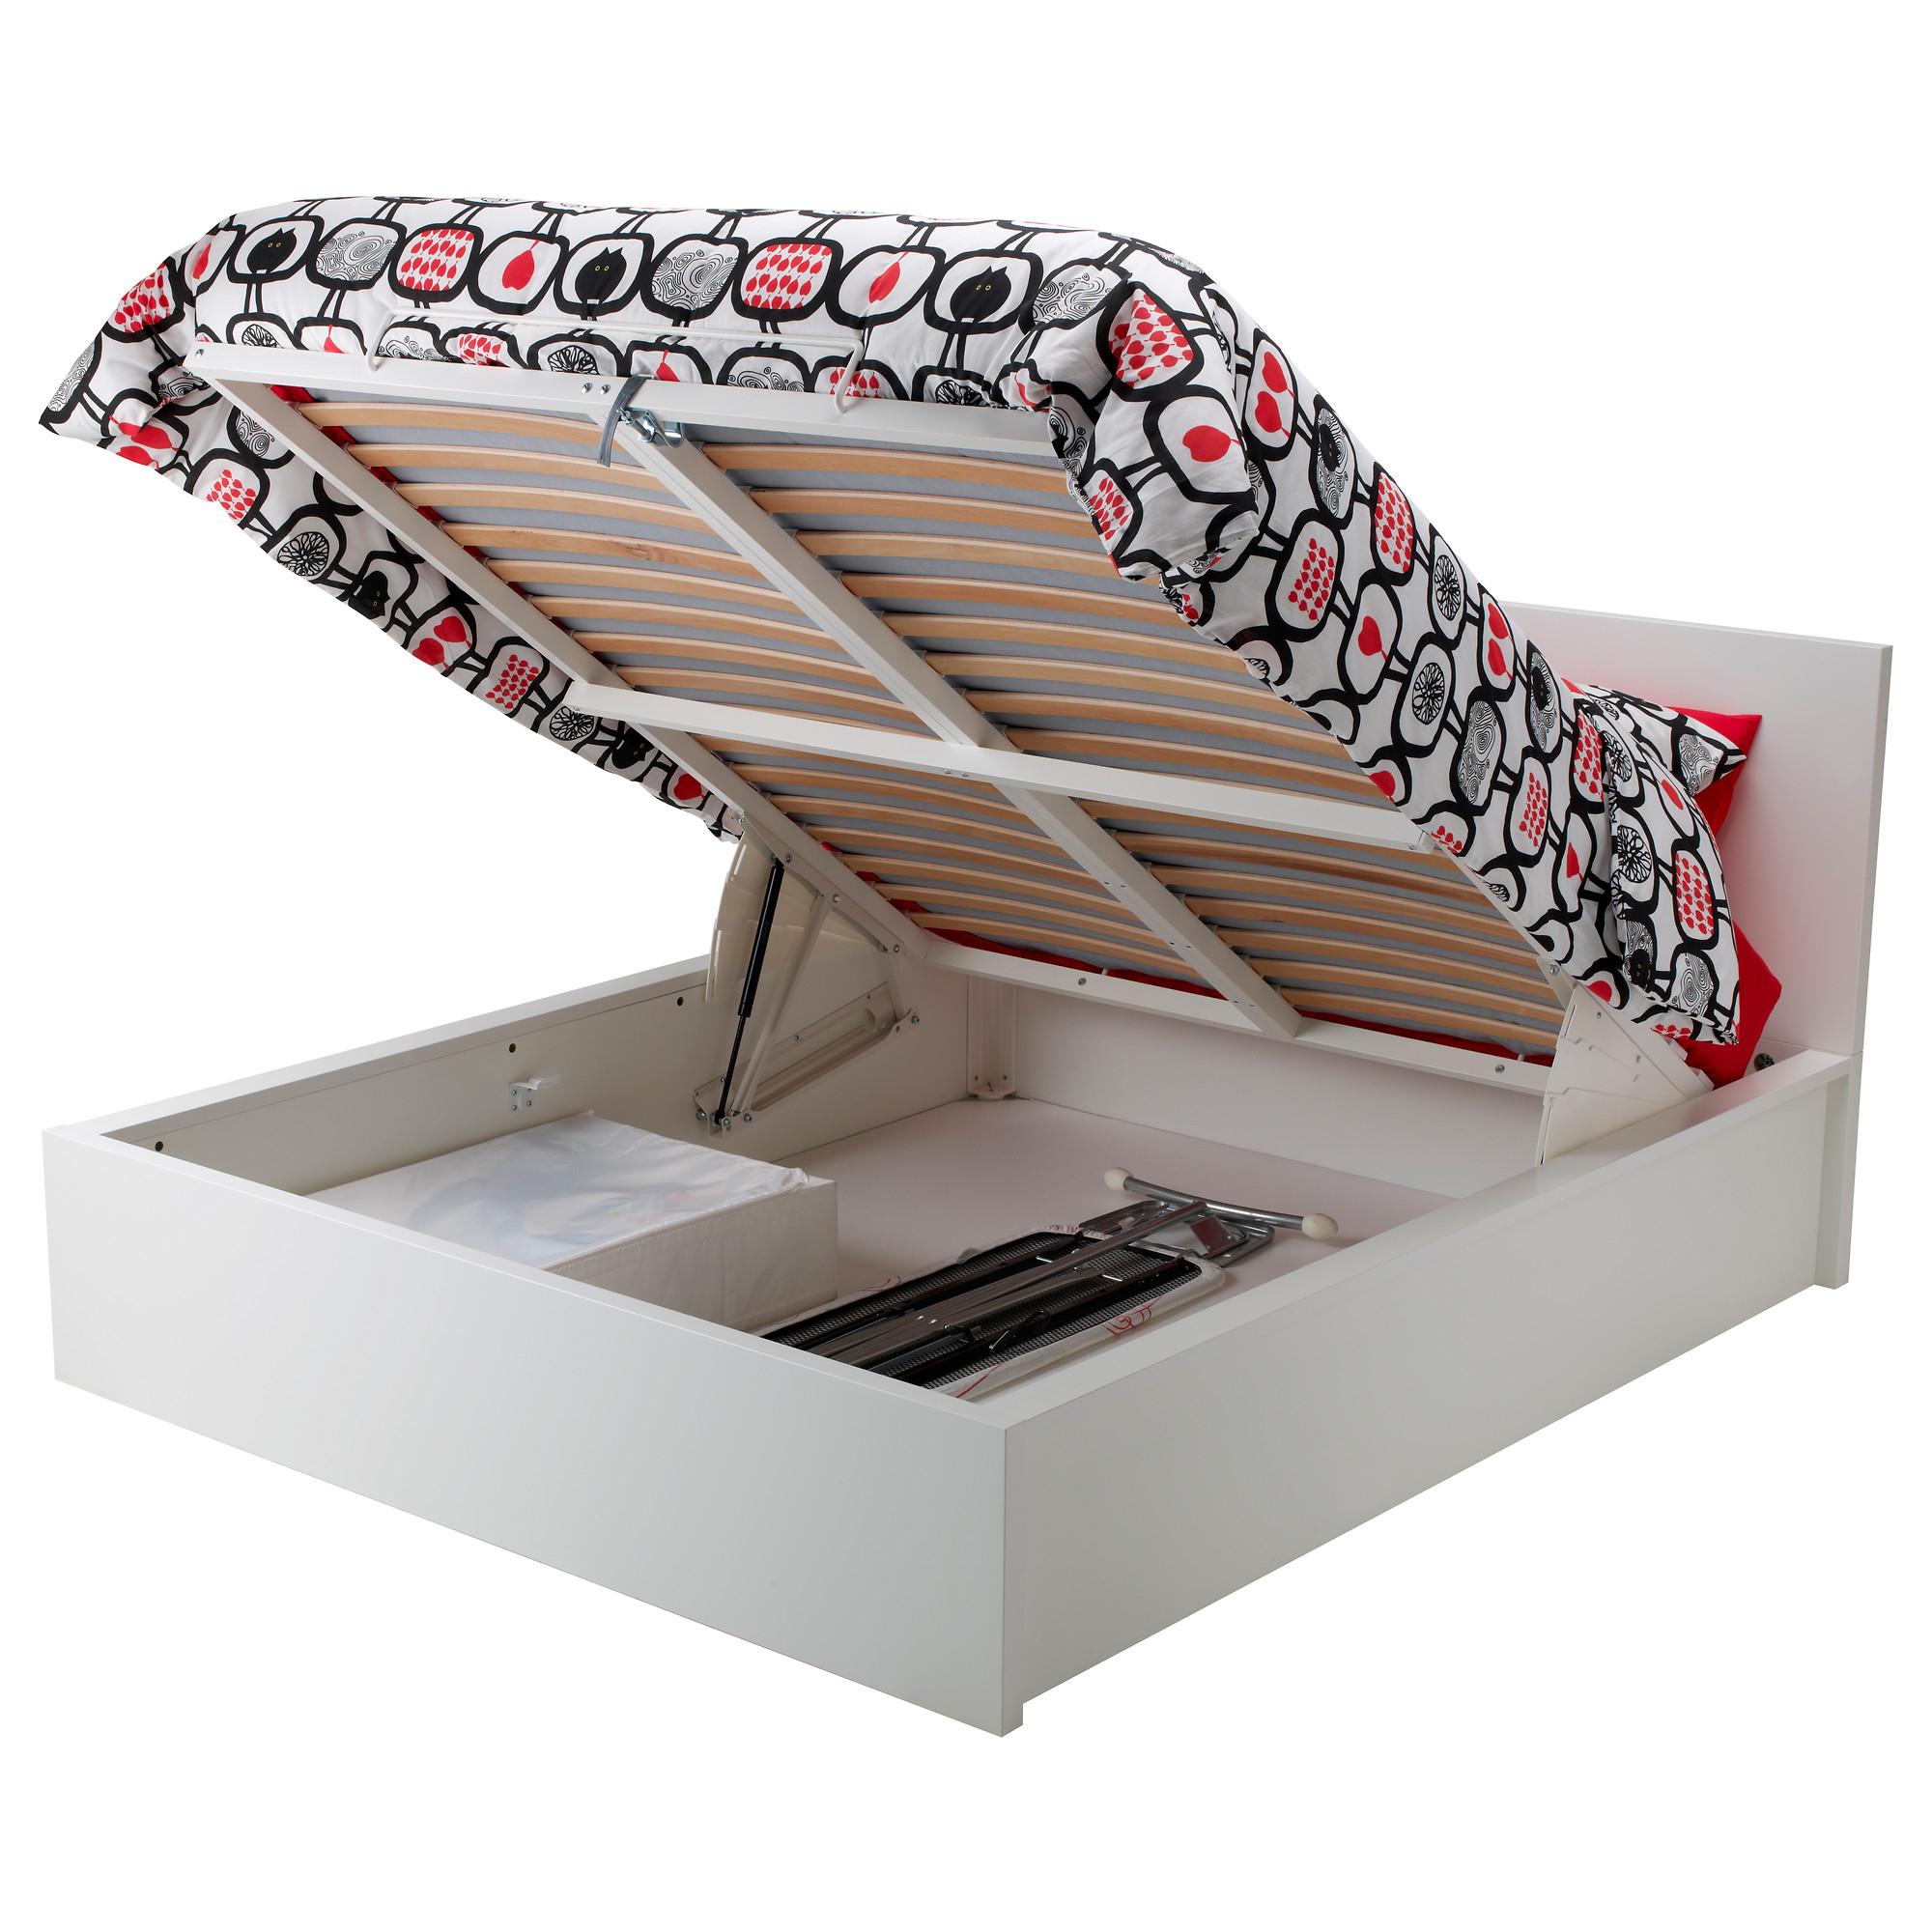 Ikea Family Cadre Lit Coffre Blanc Malm 160 X 200 Cm